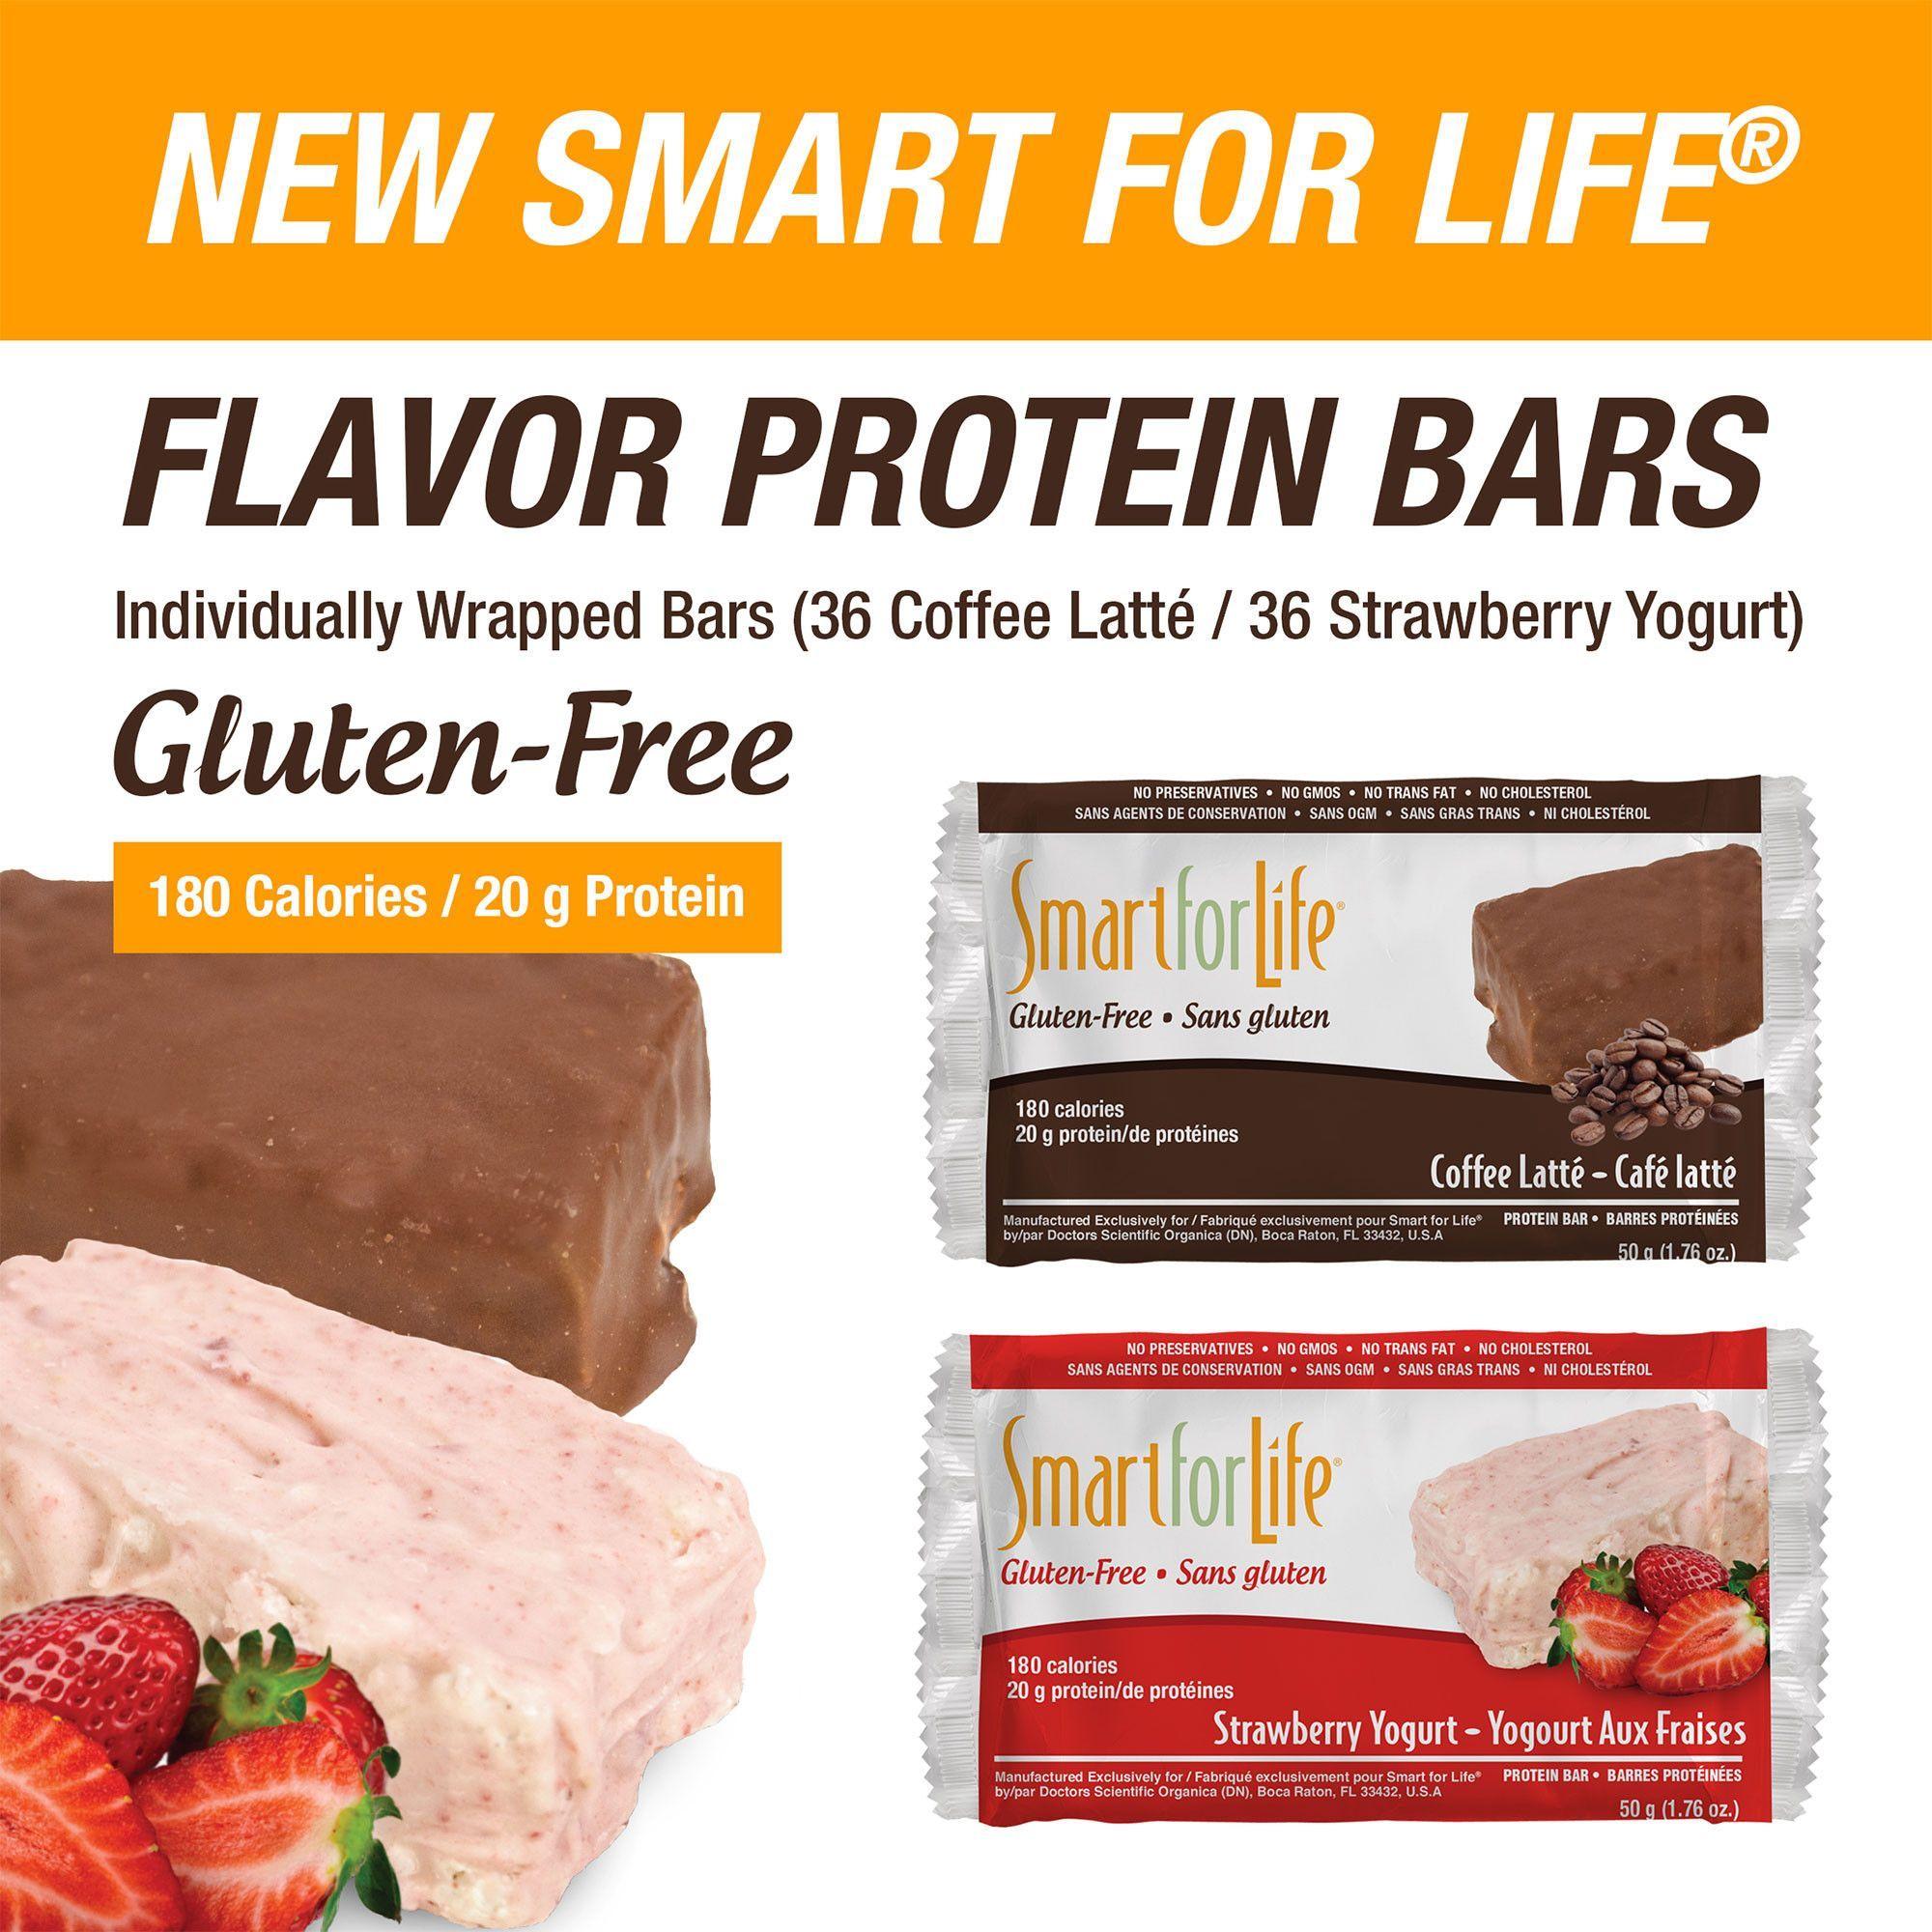 Smart For Life Strawberry Yogurt & Coffee Latte Gluten